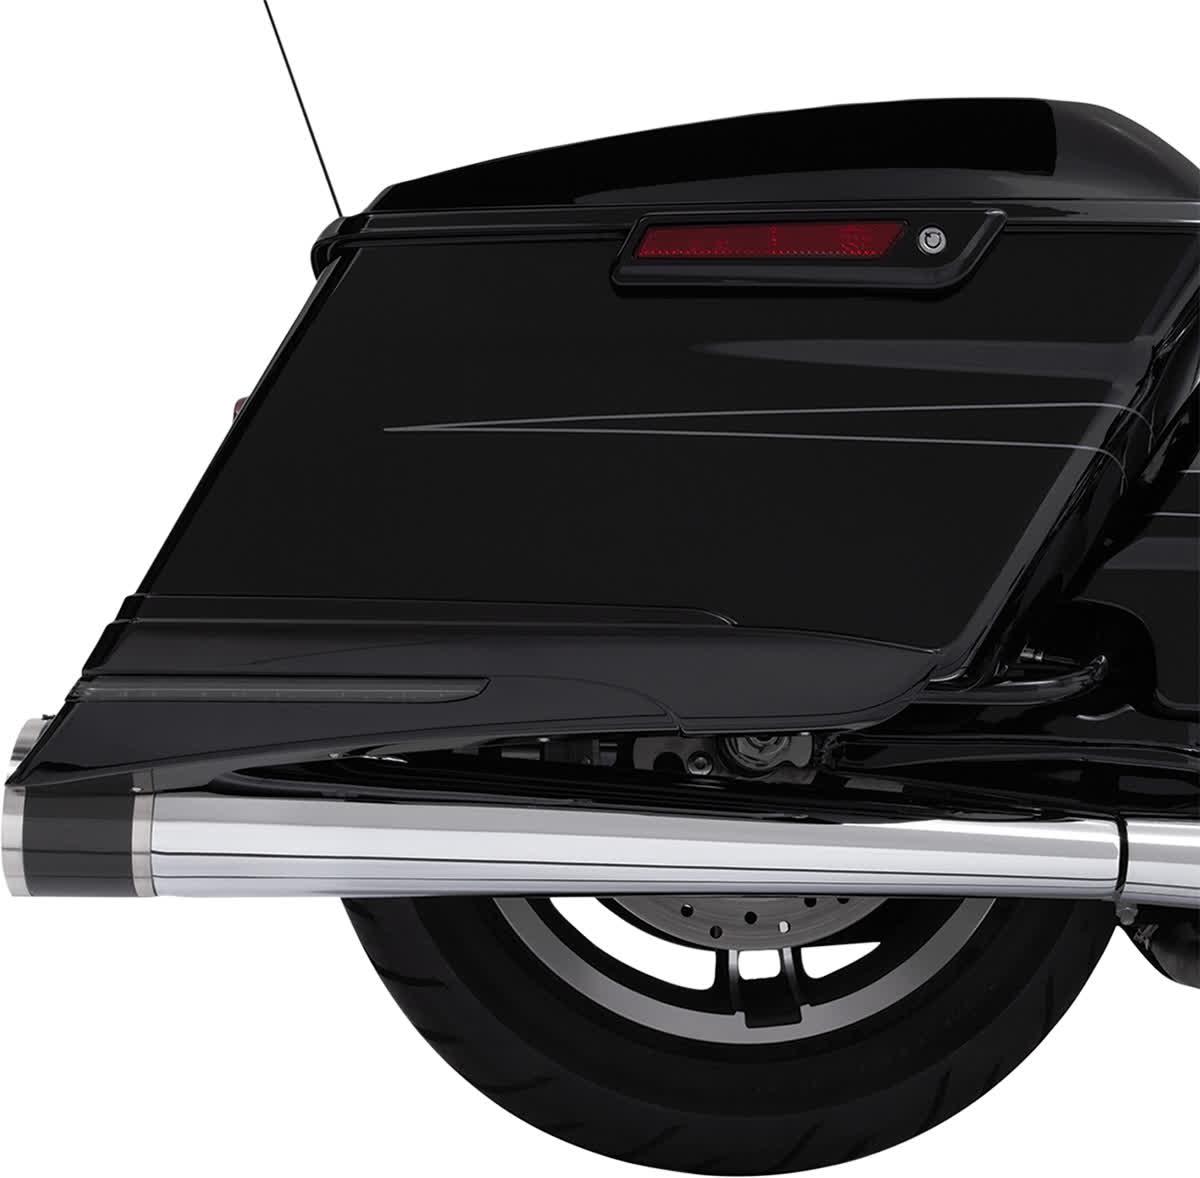 "Ciro 31400 4"" Slip-On Muffler End Caps  Stainless Steel and Carbon Fiber"